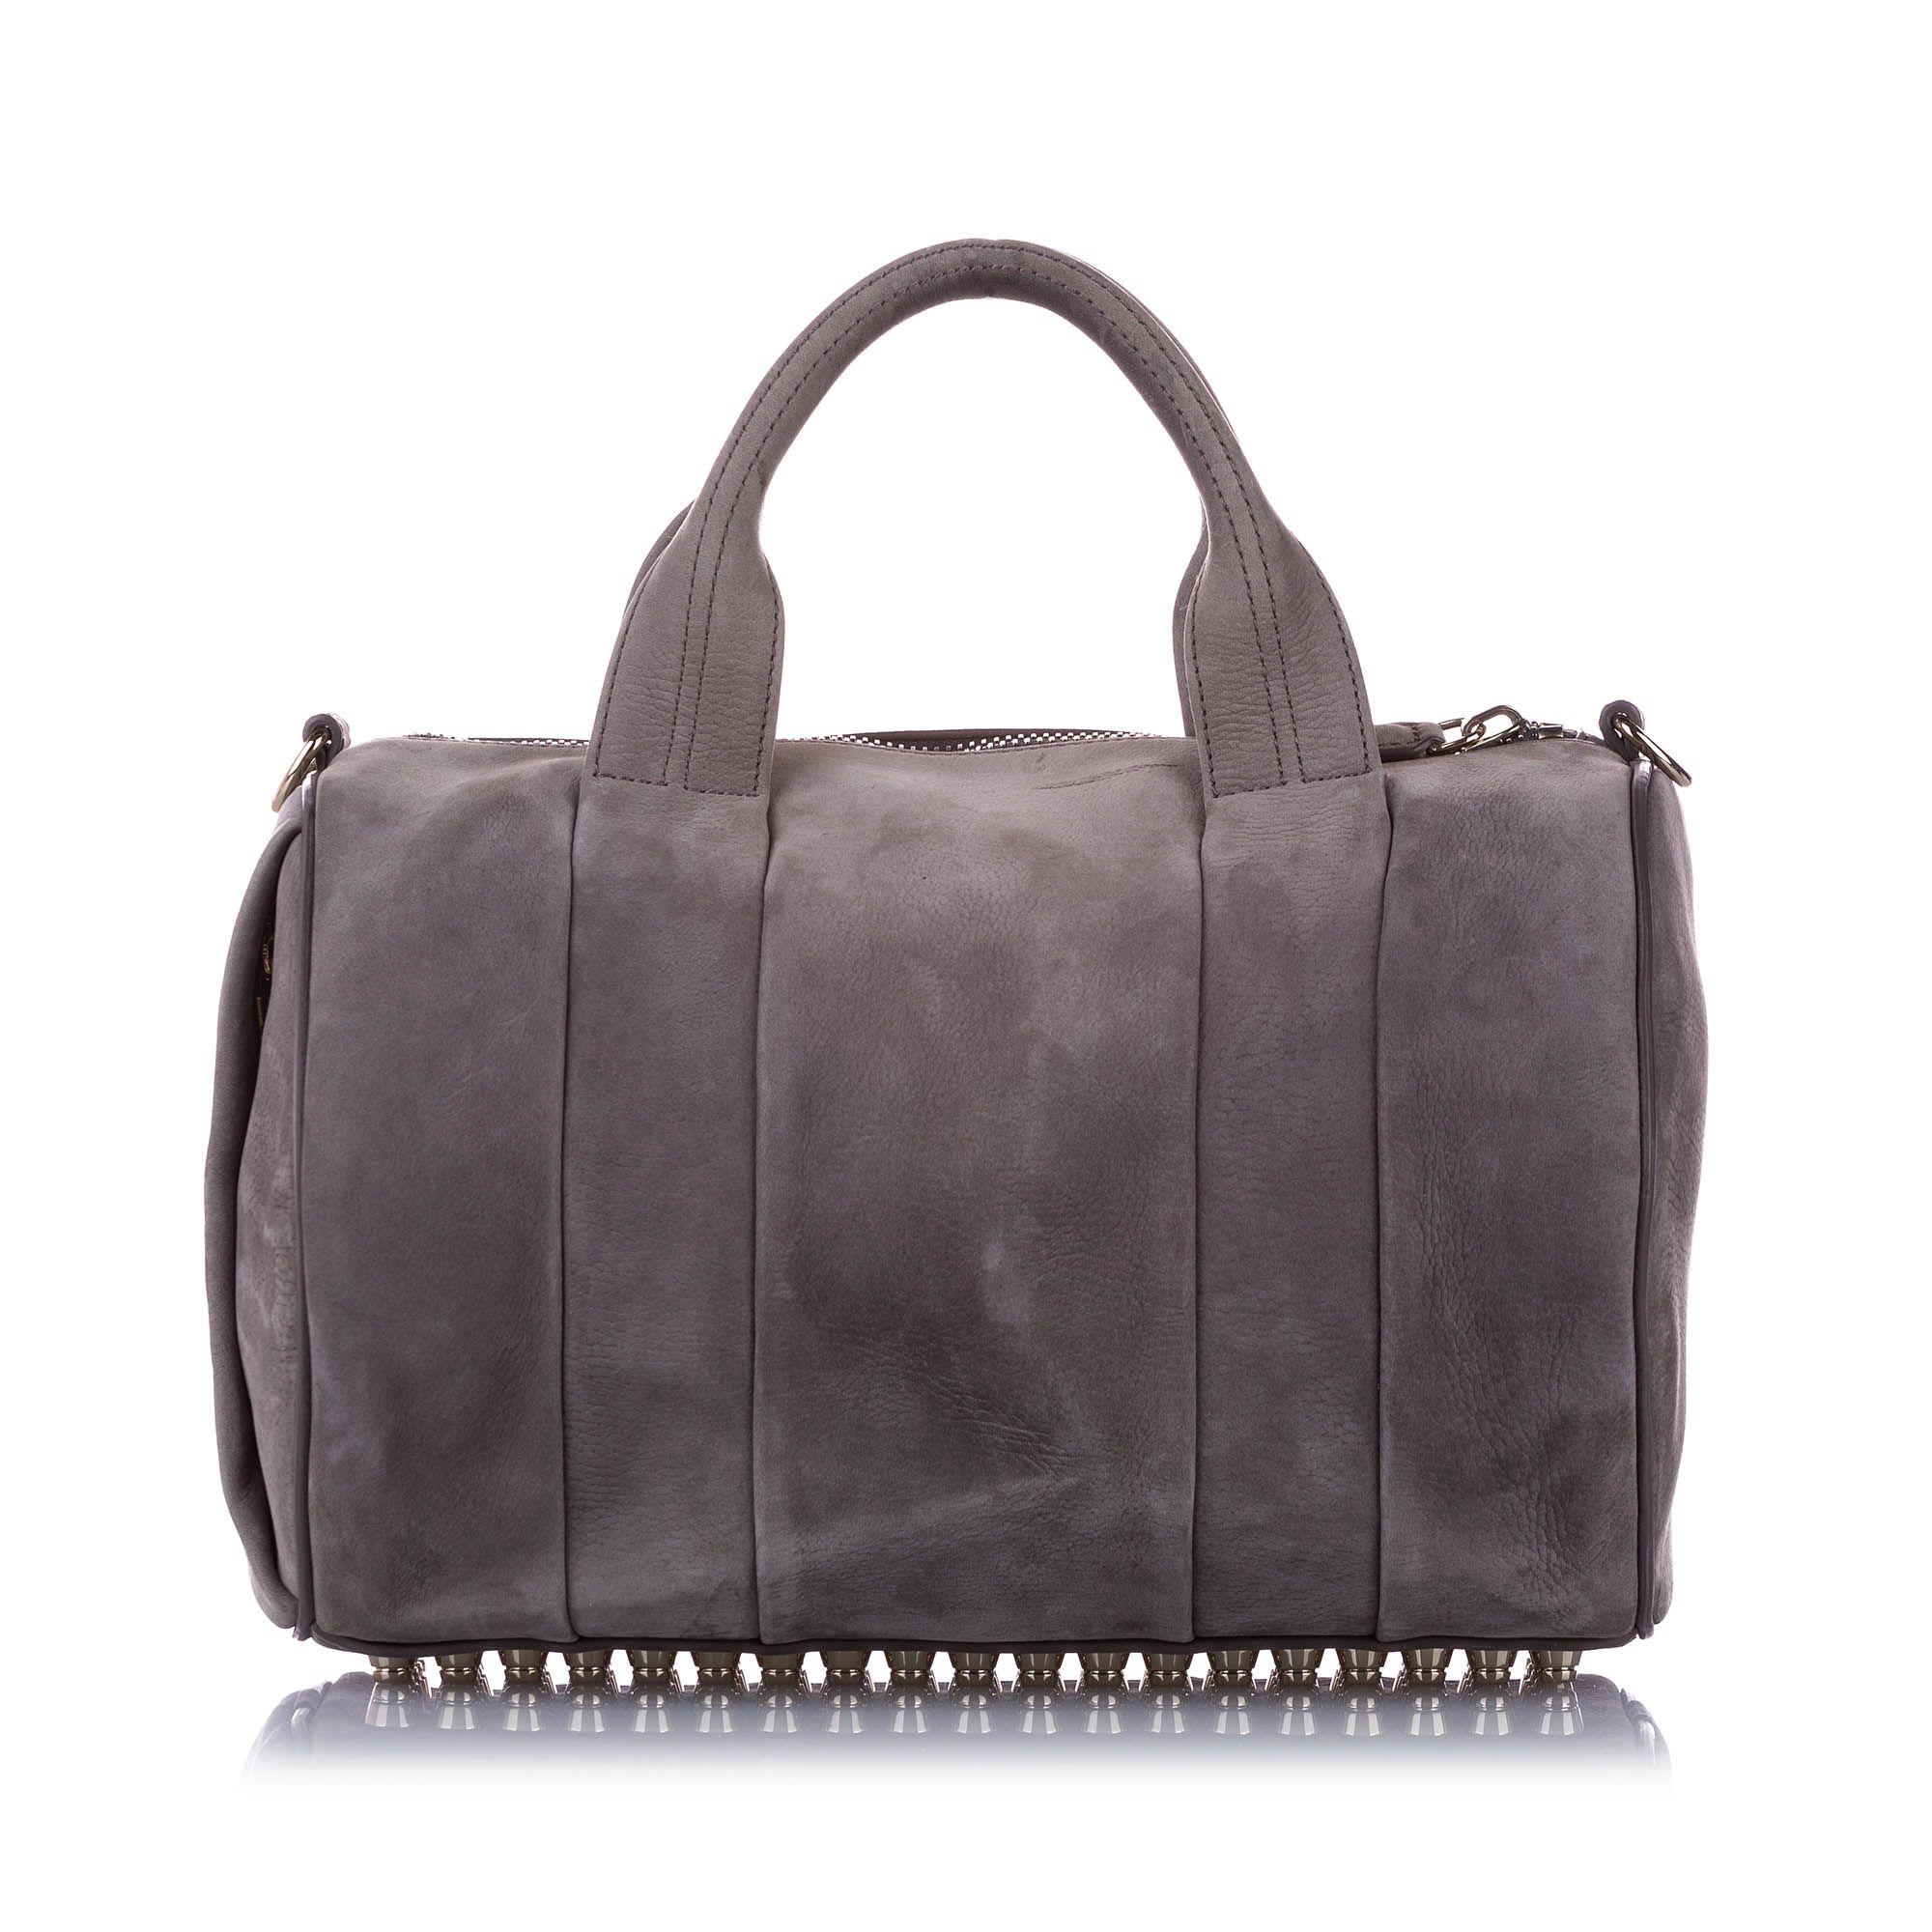 Vintage Alexander Wang Rockie Leather Satchel Gray